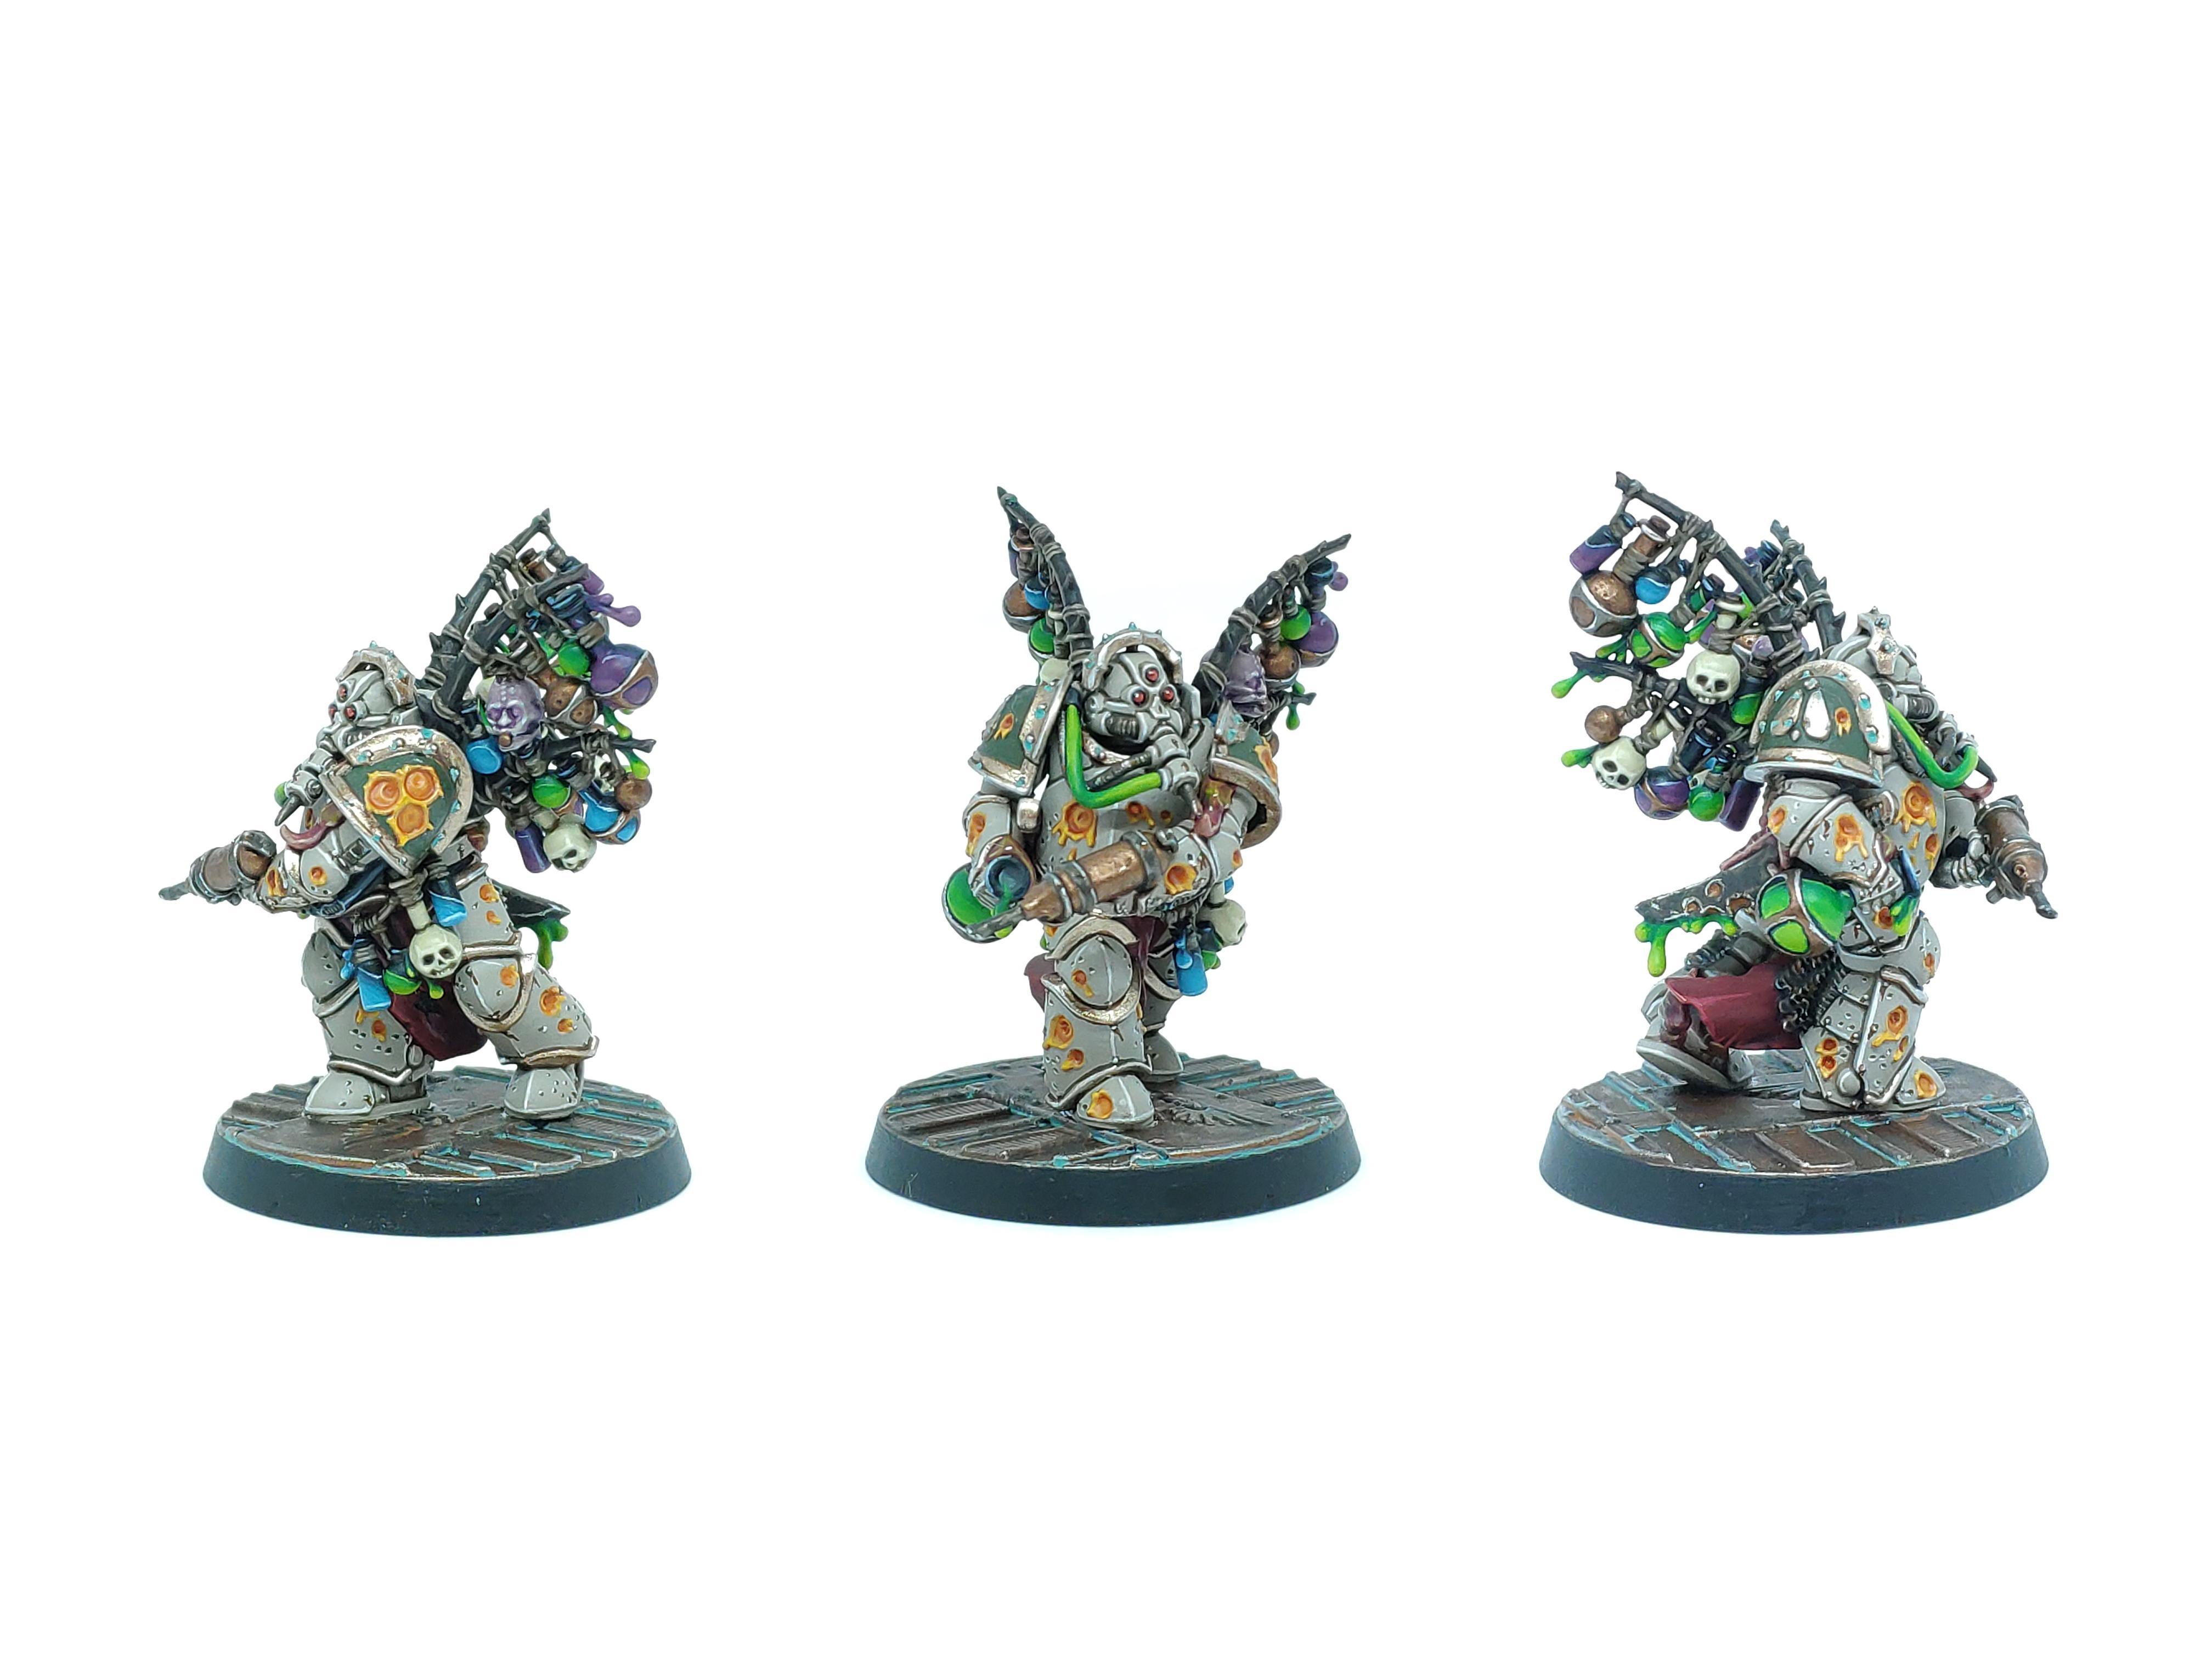 Biologus Putrifier, Chaos, Citadel, Death Guard, Nurgle, Warhammer 40,000, Warhammer Fantasy